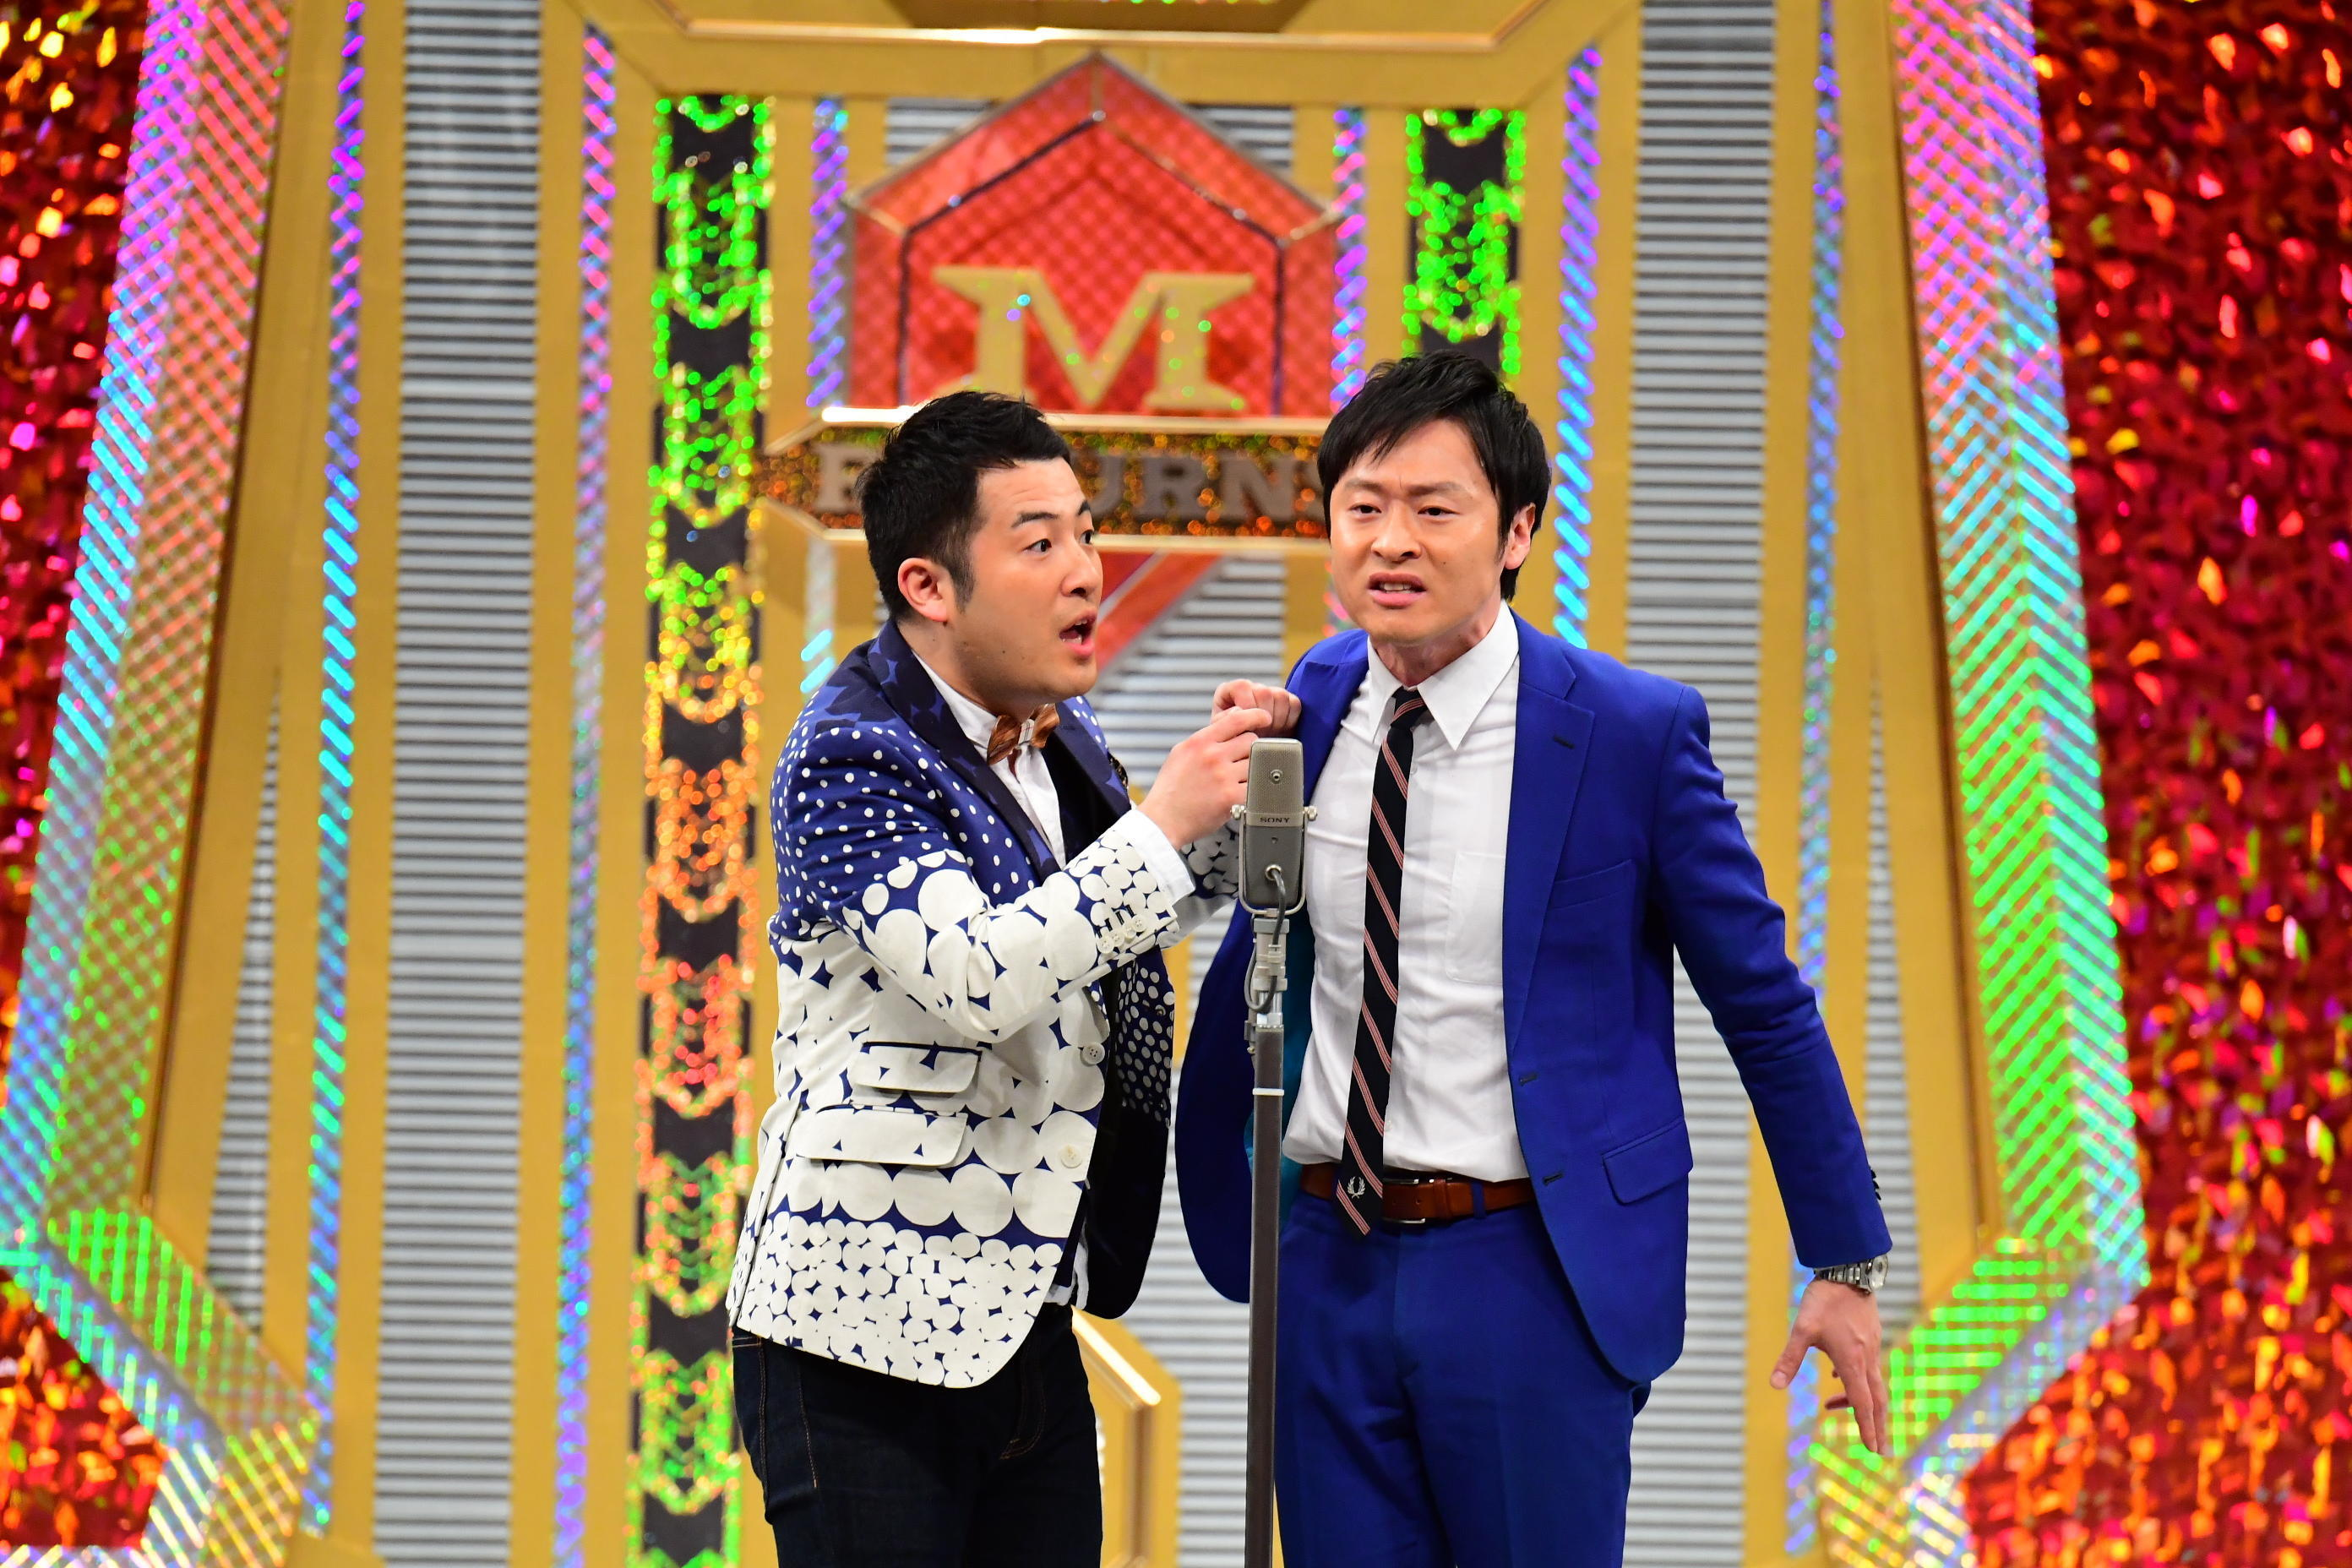 http://news.yoshimoto.co.jp/20170228155731-4e5abd0f5d6cef8279dd0c3f84d349c4c879be02.jpg